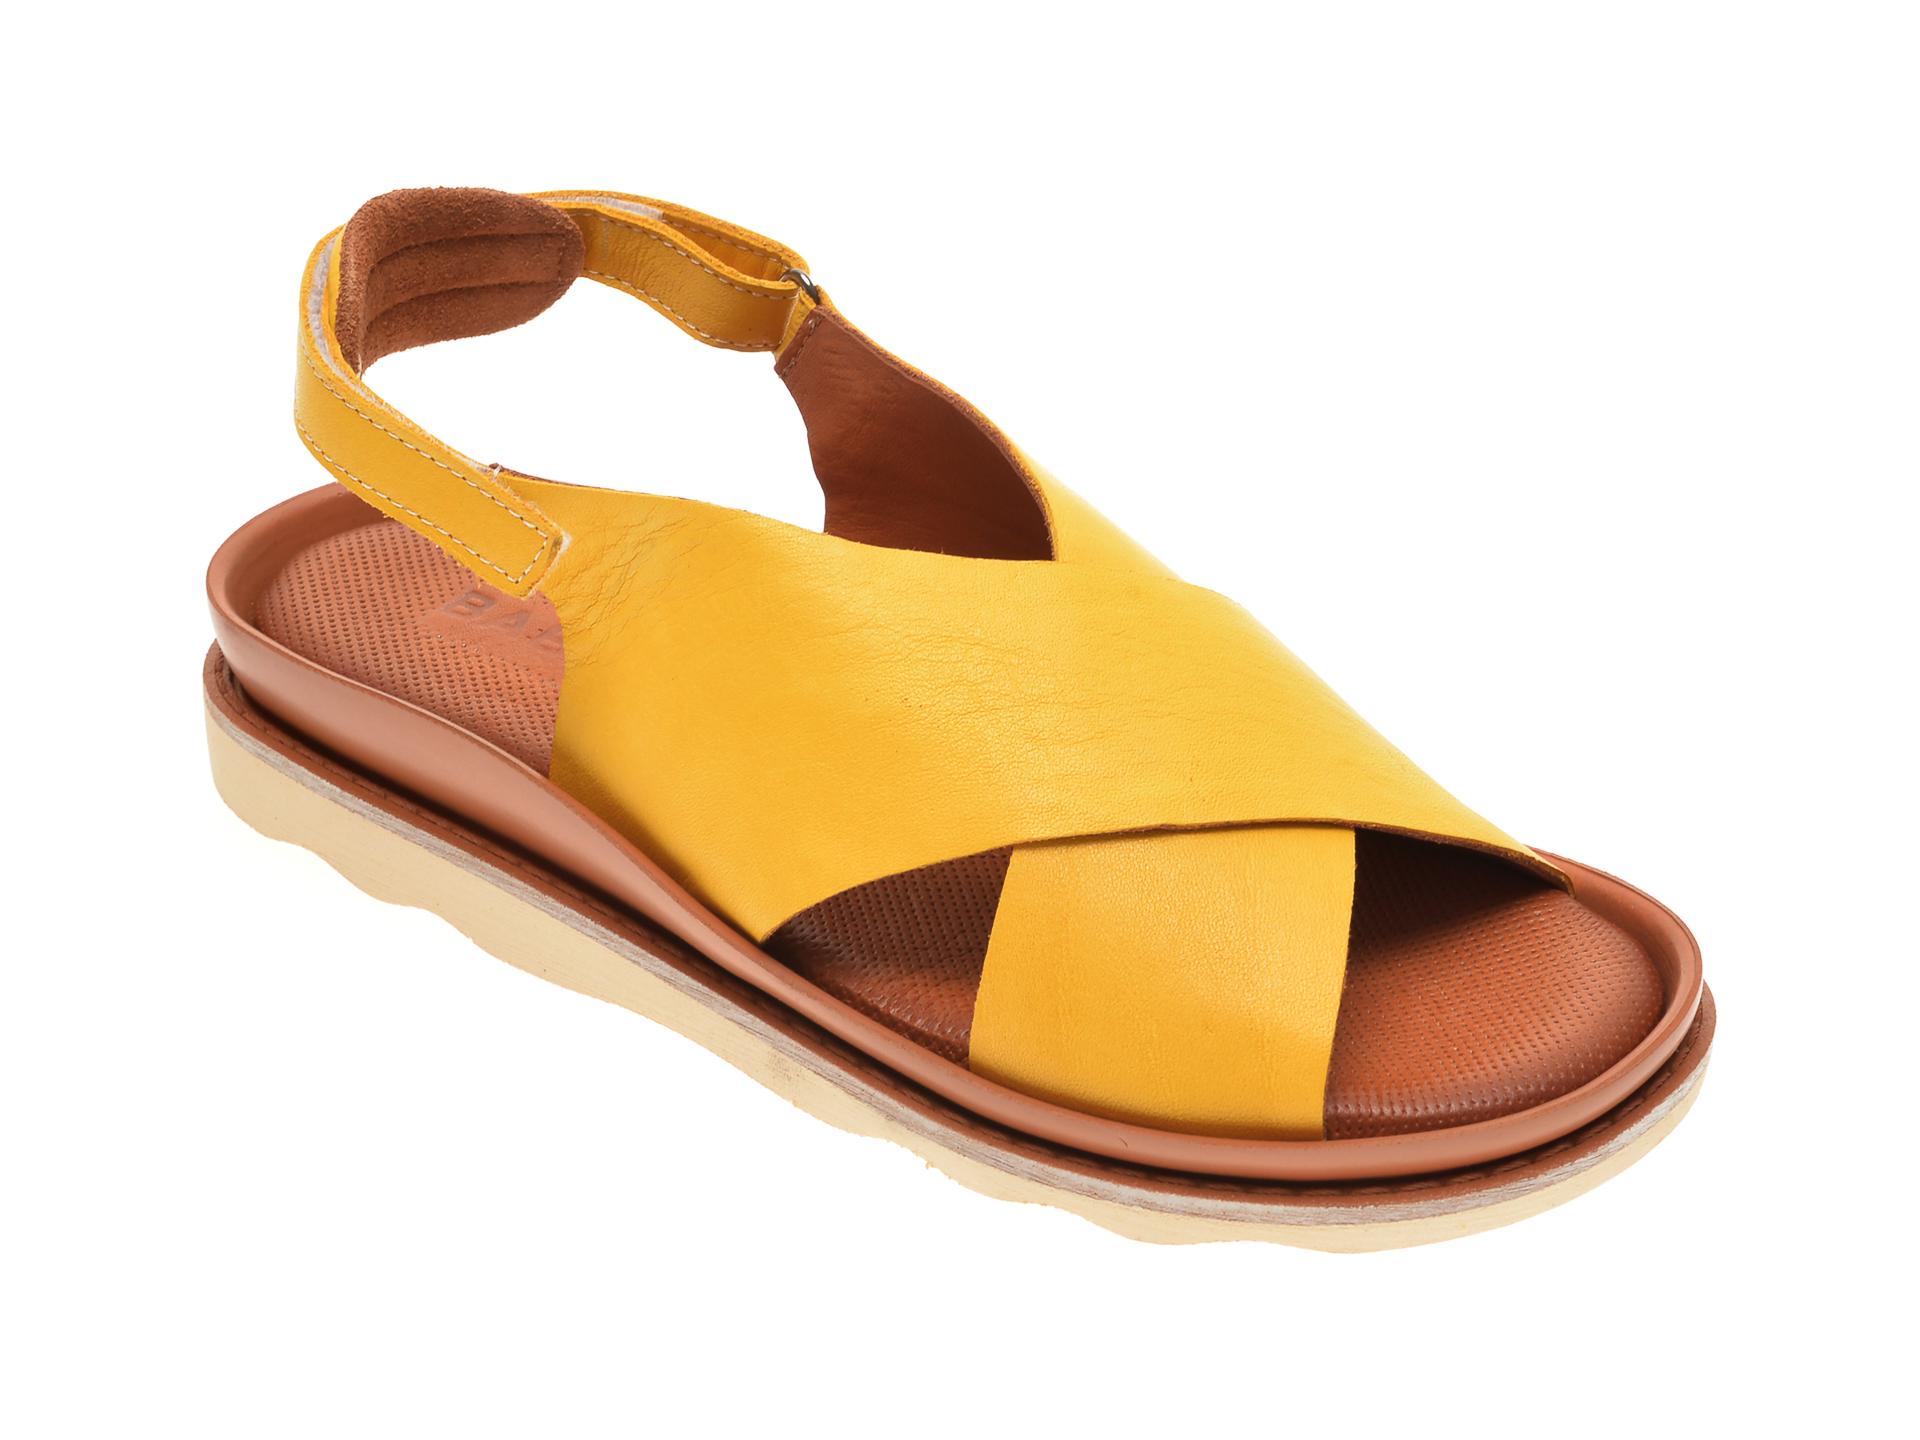 Sandale BABOOS galbene, 0403, din piele naturala imagine otter.ro 2021